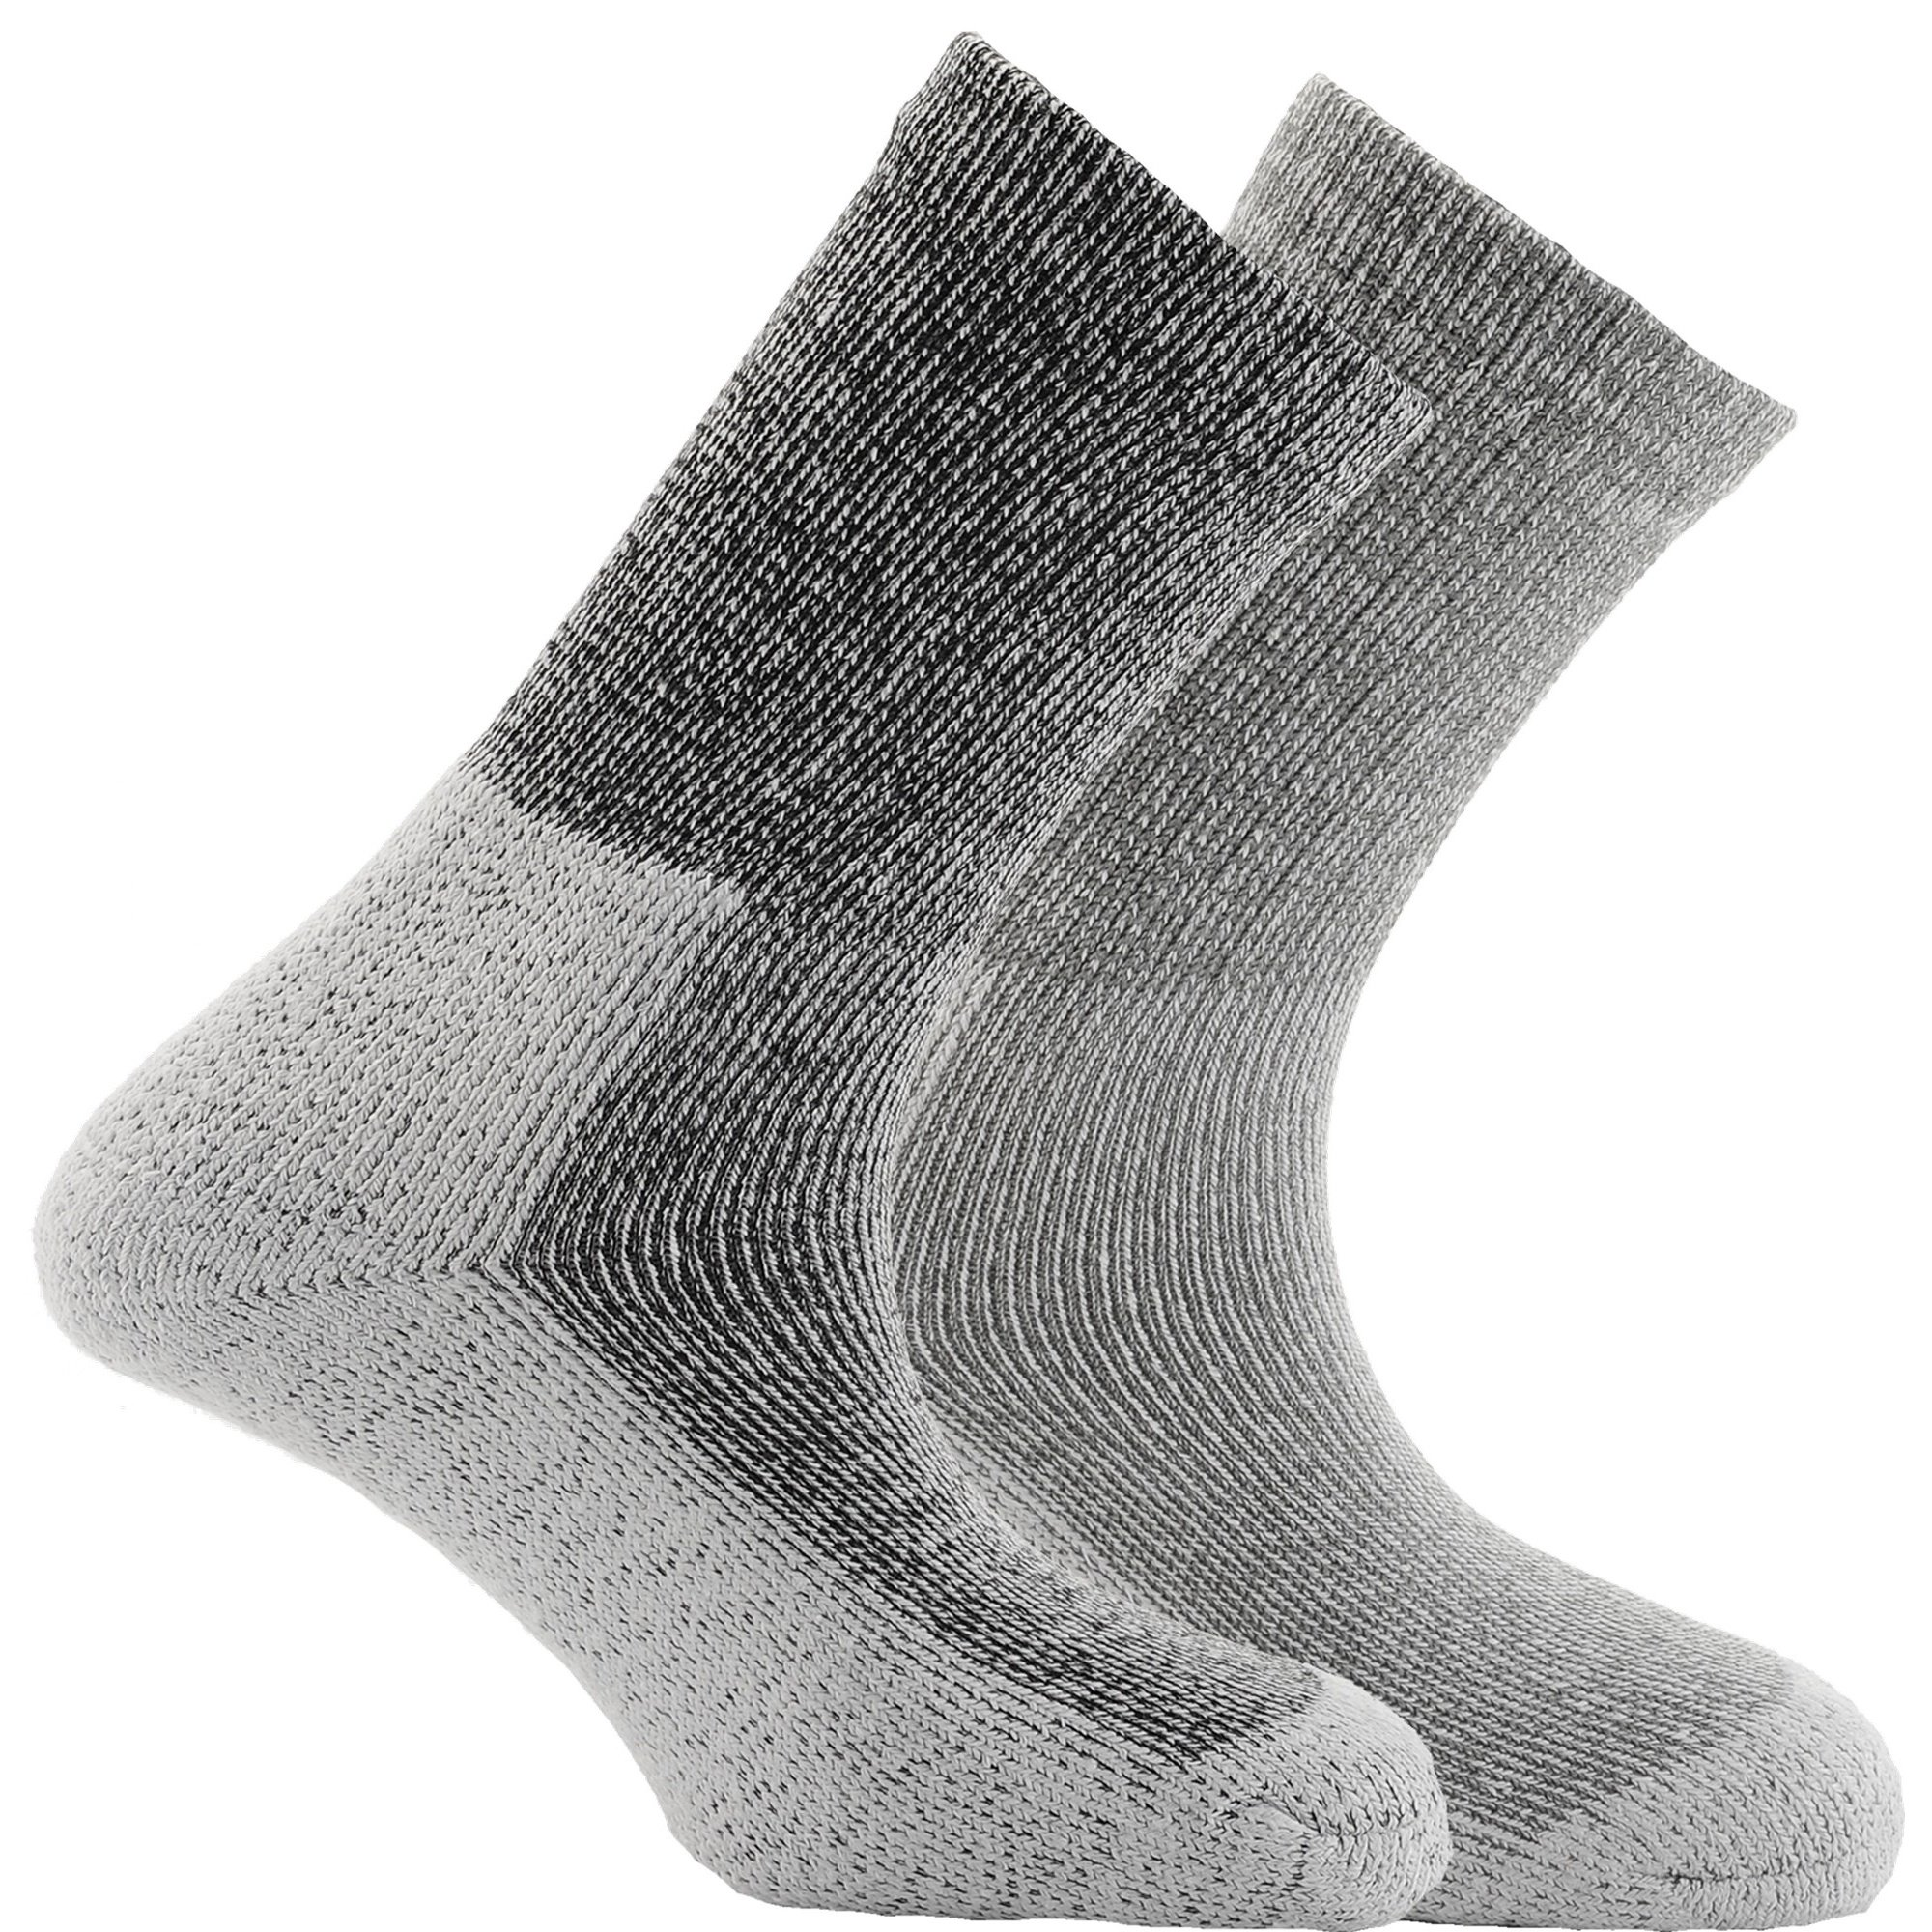 Horizon Unisex Deluxe Coolmax Outdoor Socks (Pack Of 2) (4.5-7.5 US) (Black Marl)